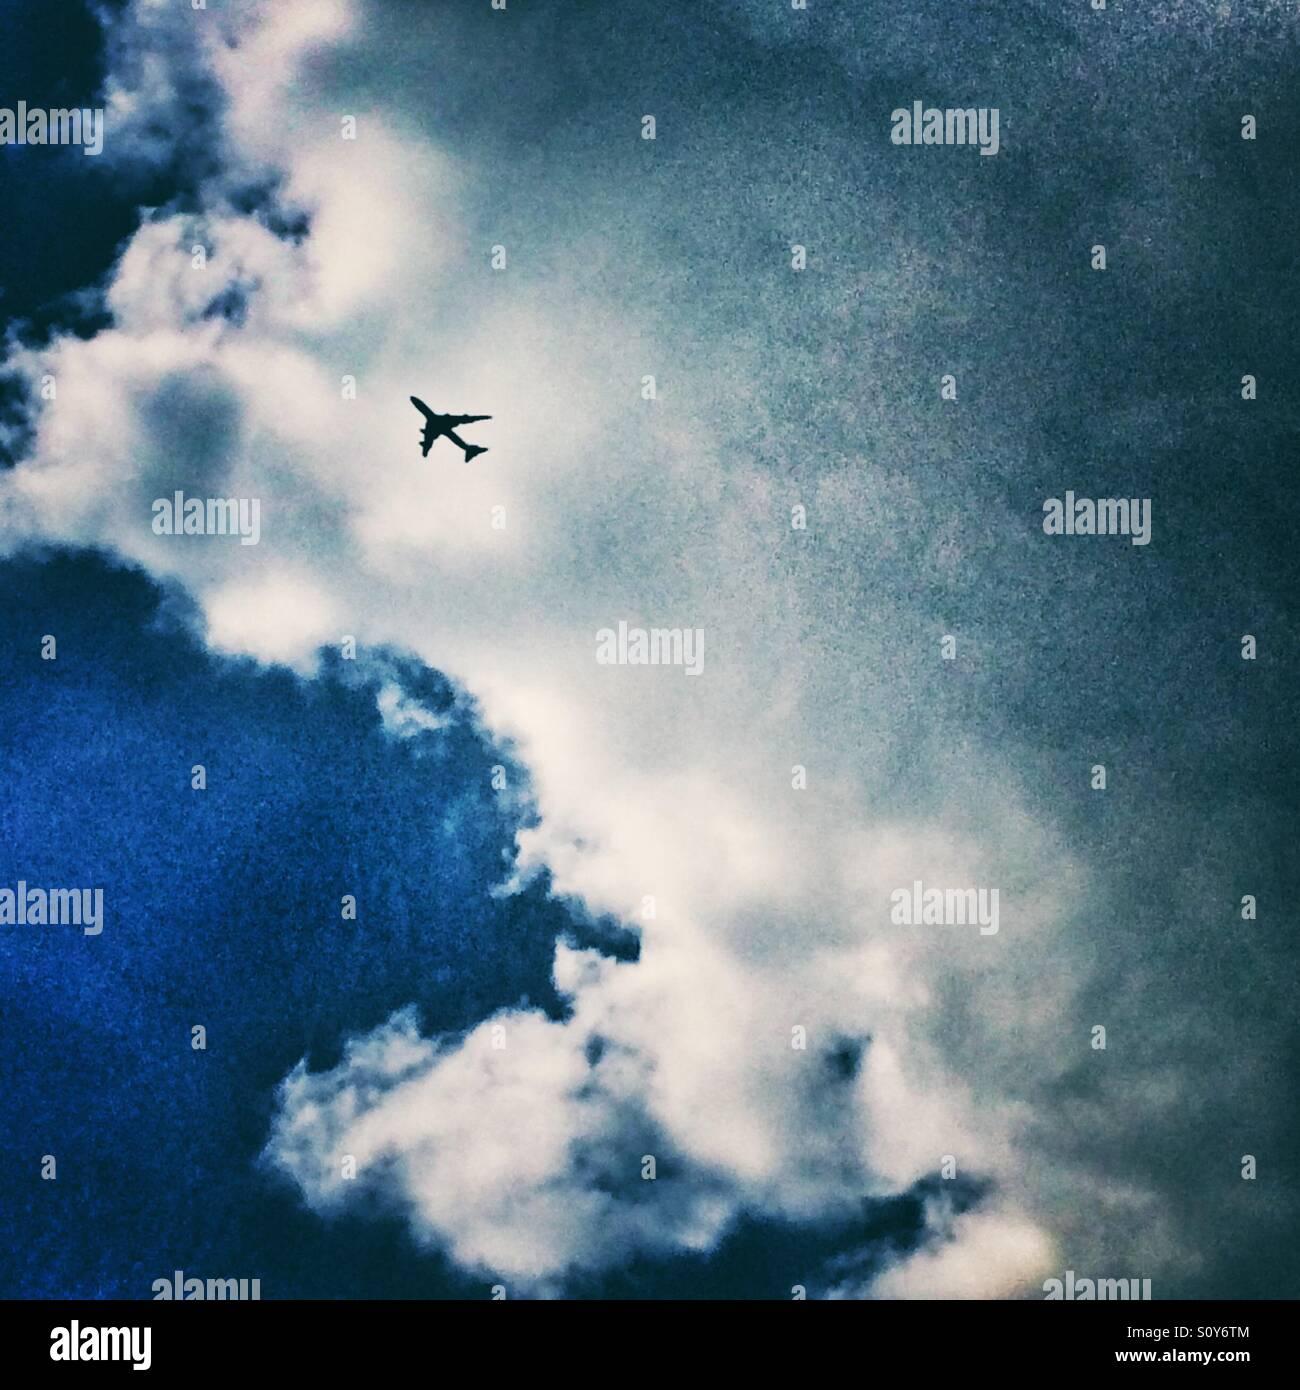 An aeroplane in the sky - Stock Image